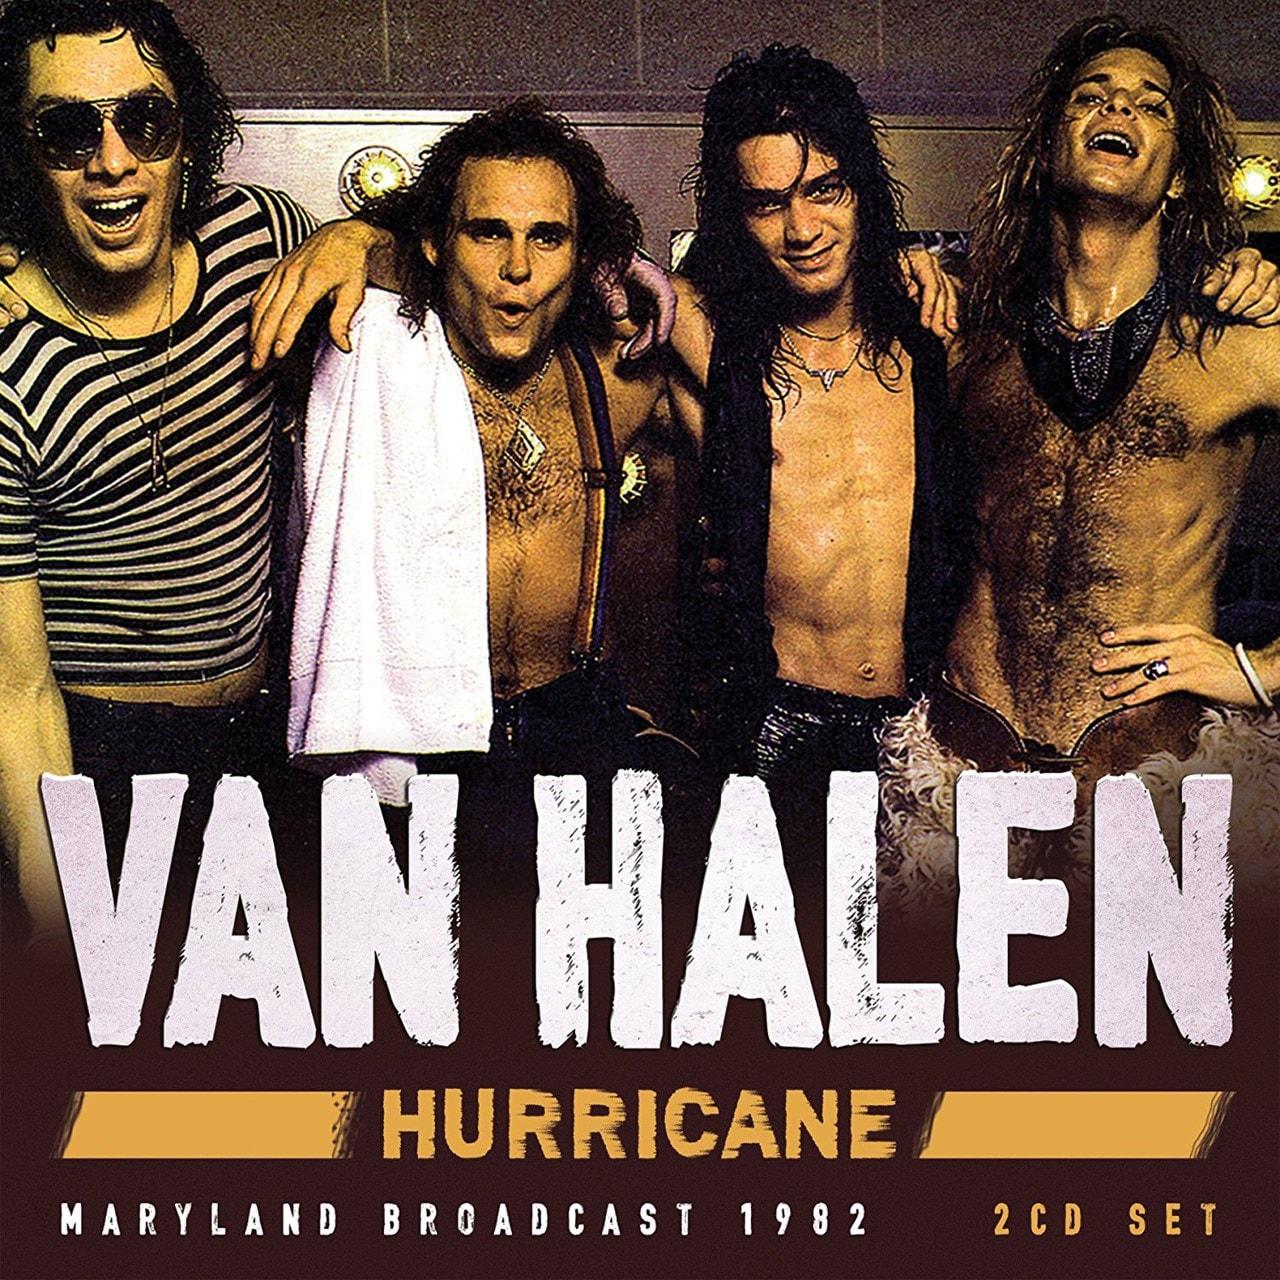 Hurricane: Maryland Broadcast 1982 - 1